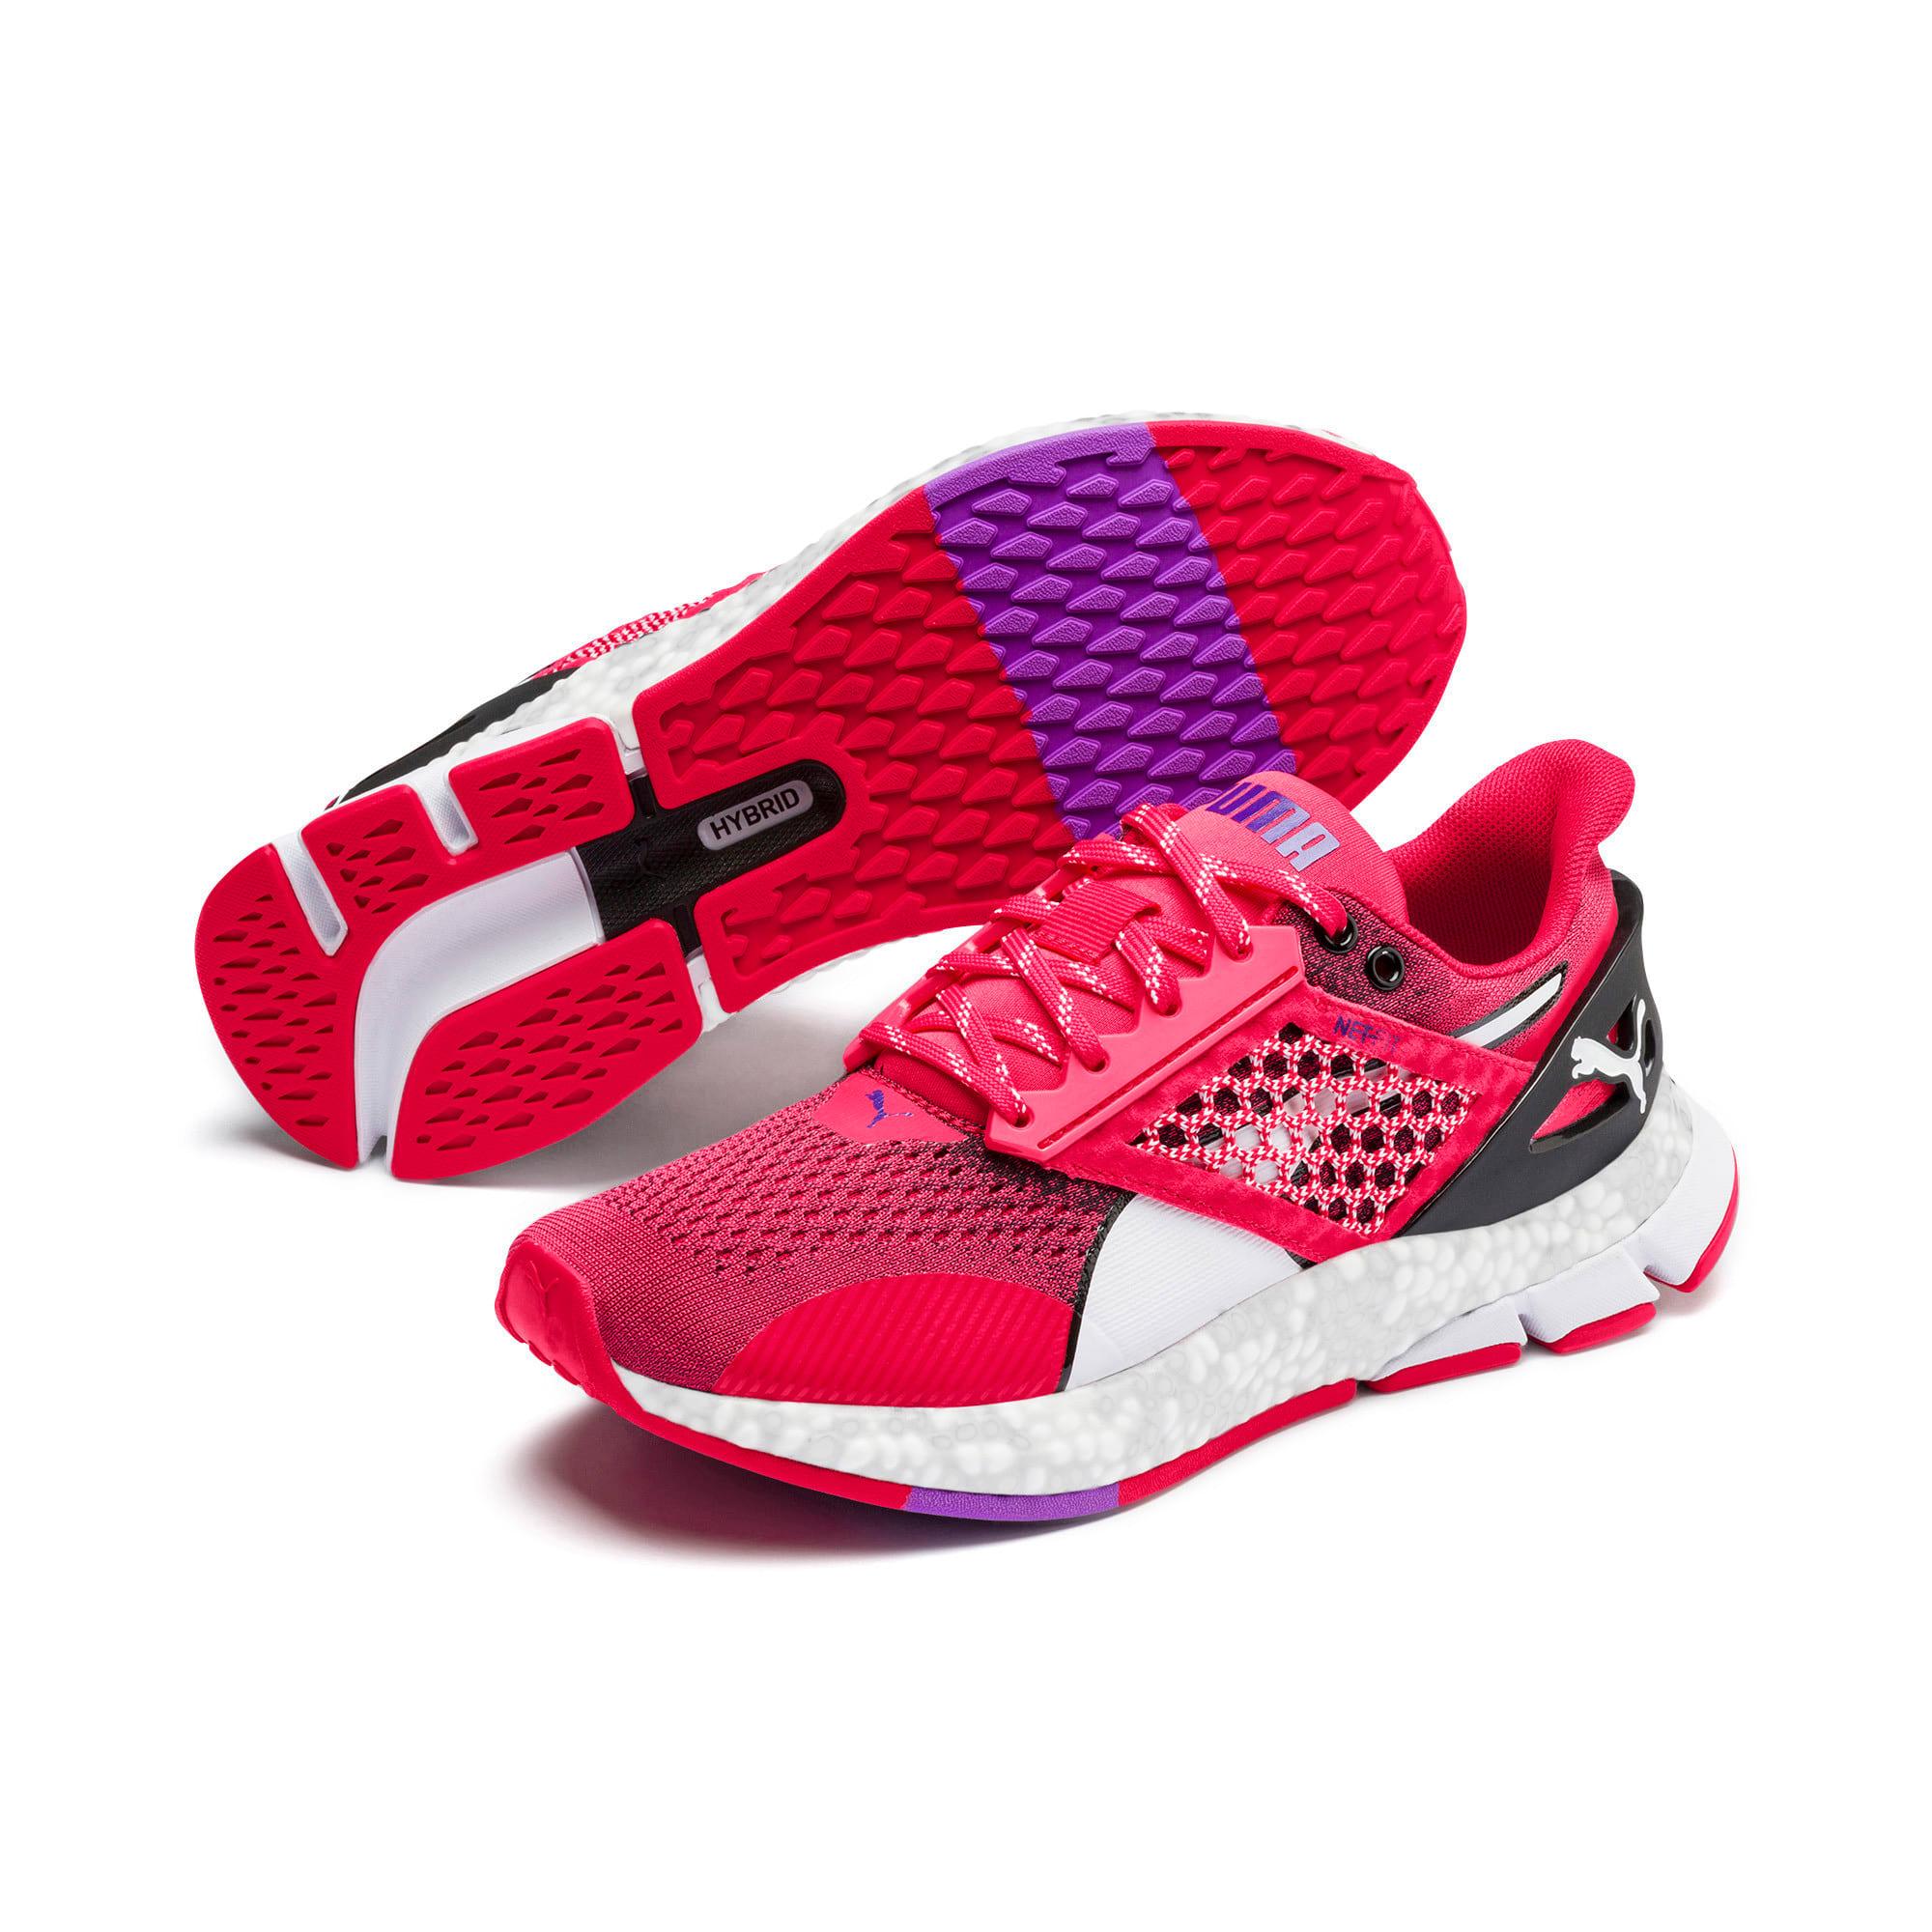 Thumbnail 3 of HYBRID NETFIT Astro Women's Running Shoes, Nrgy Rose-Puma Black, medium